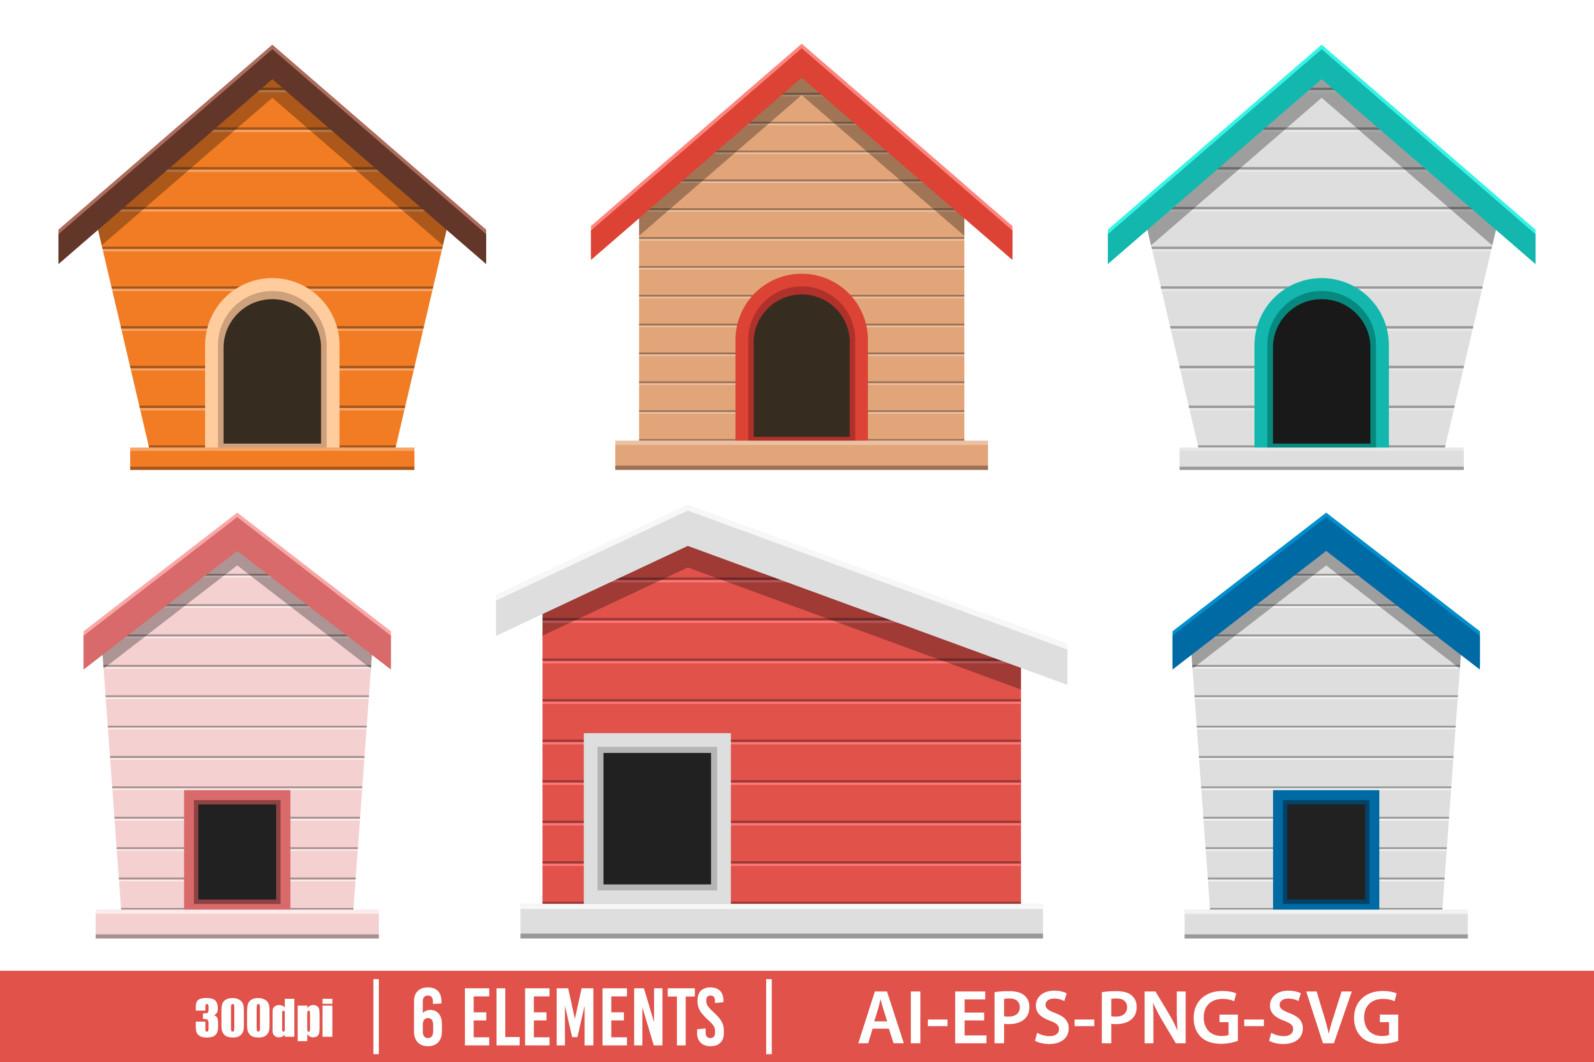 Dog house clipart vector design illustration. Dog house set. Vector Clipart Print - DOG HOUSE 1 scaled -